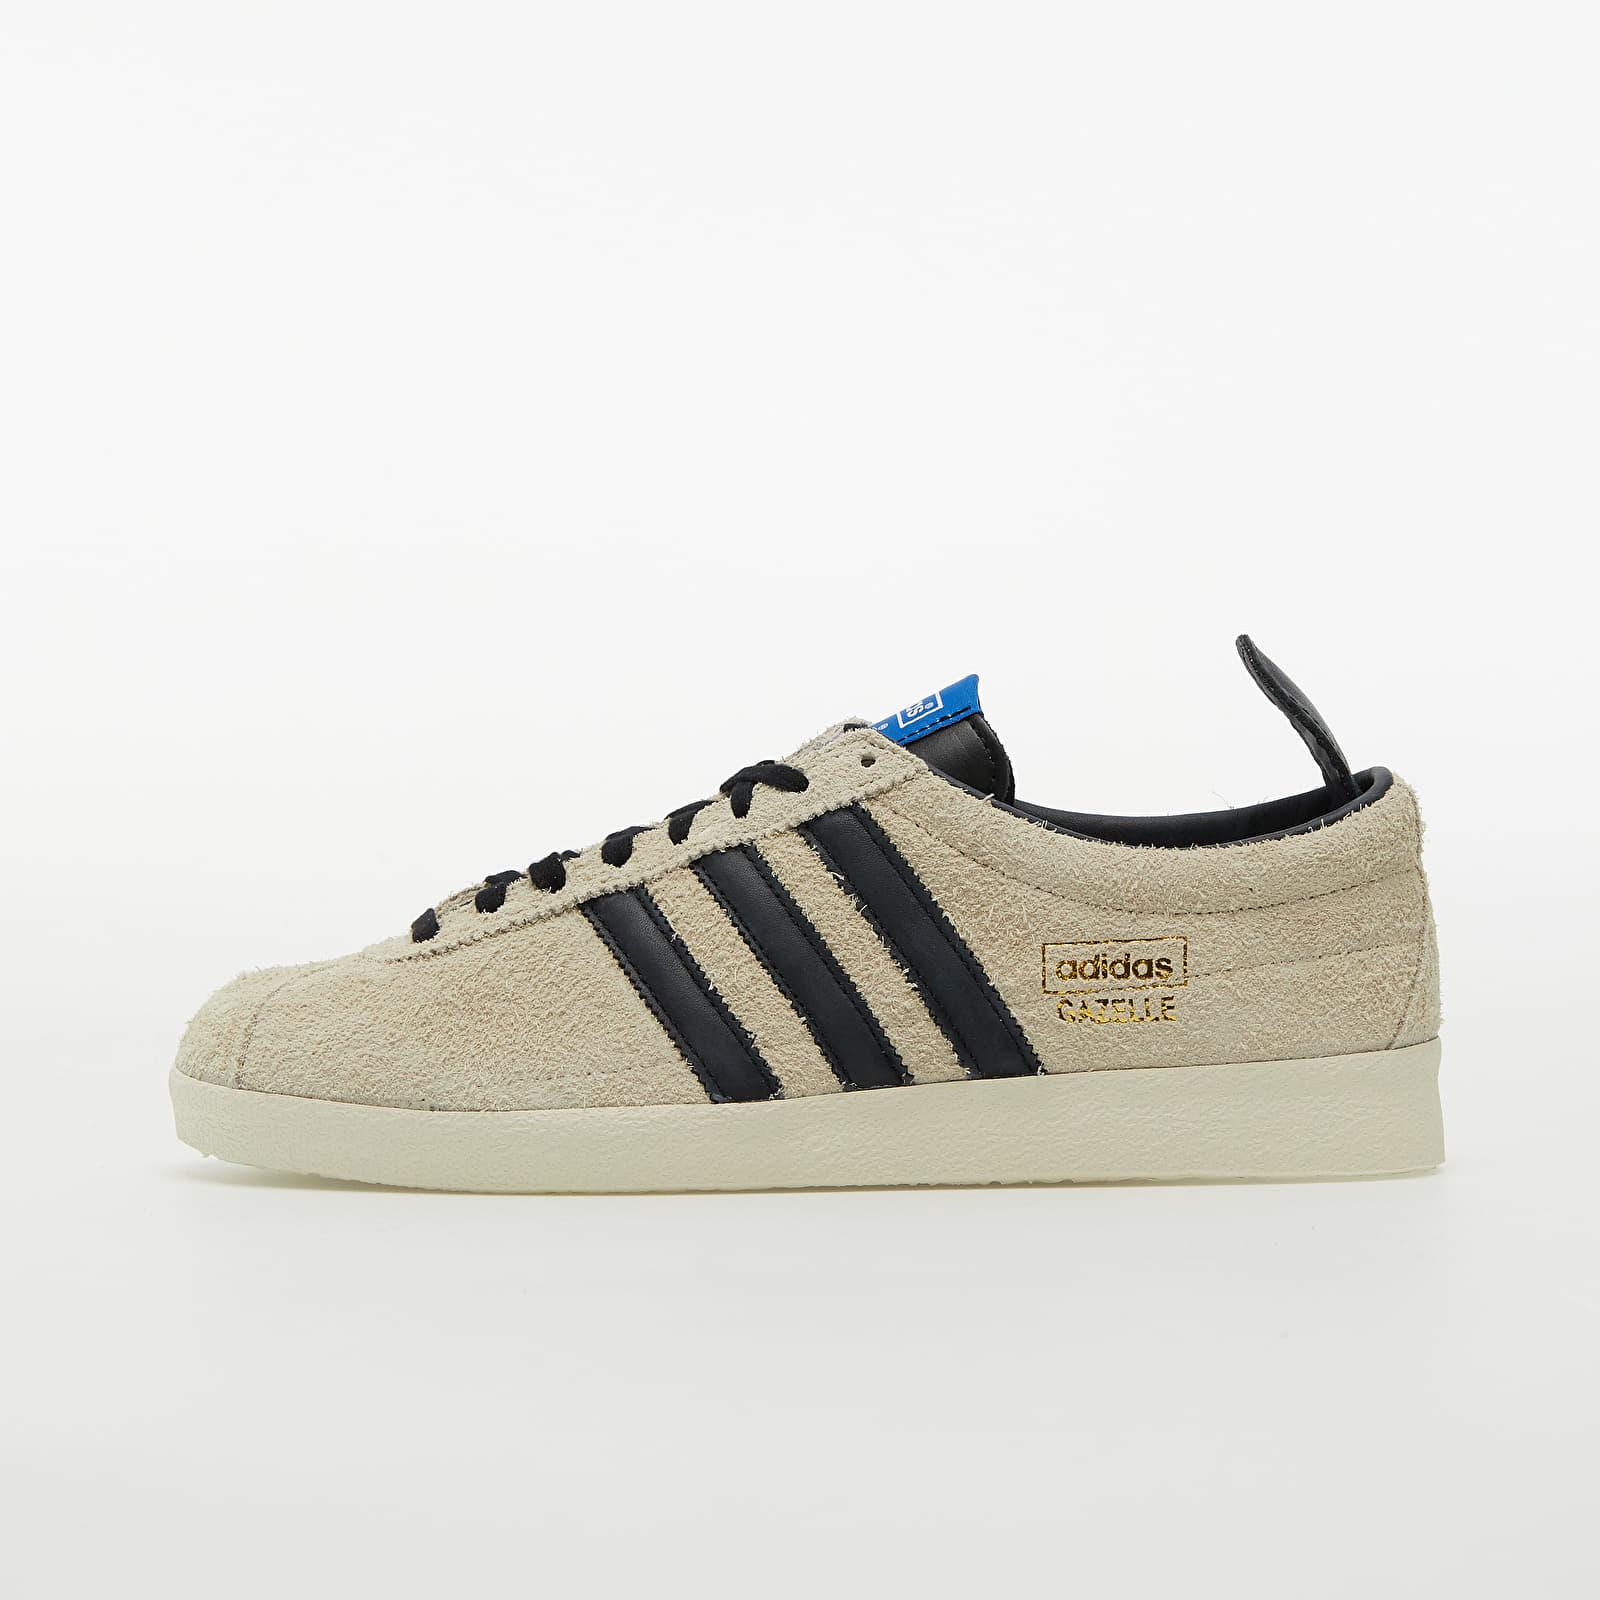 adidas Gazelle Vintage Core White/ Core Black/ Blue EUR 44 2/3